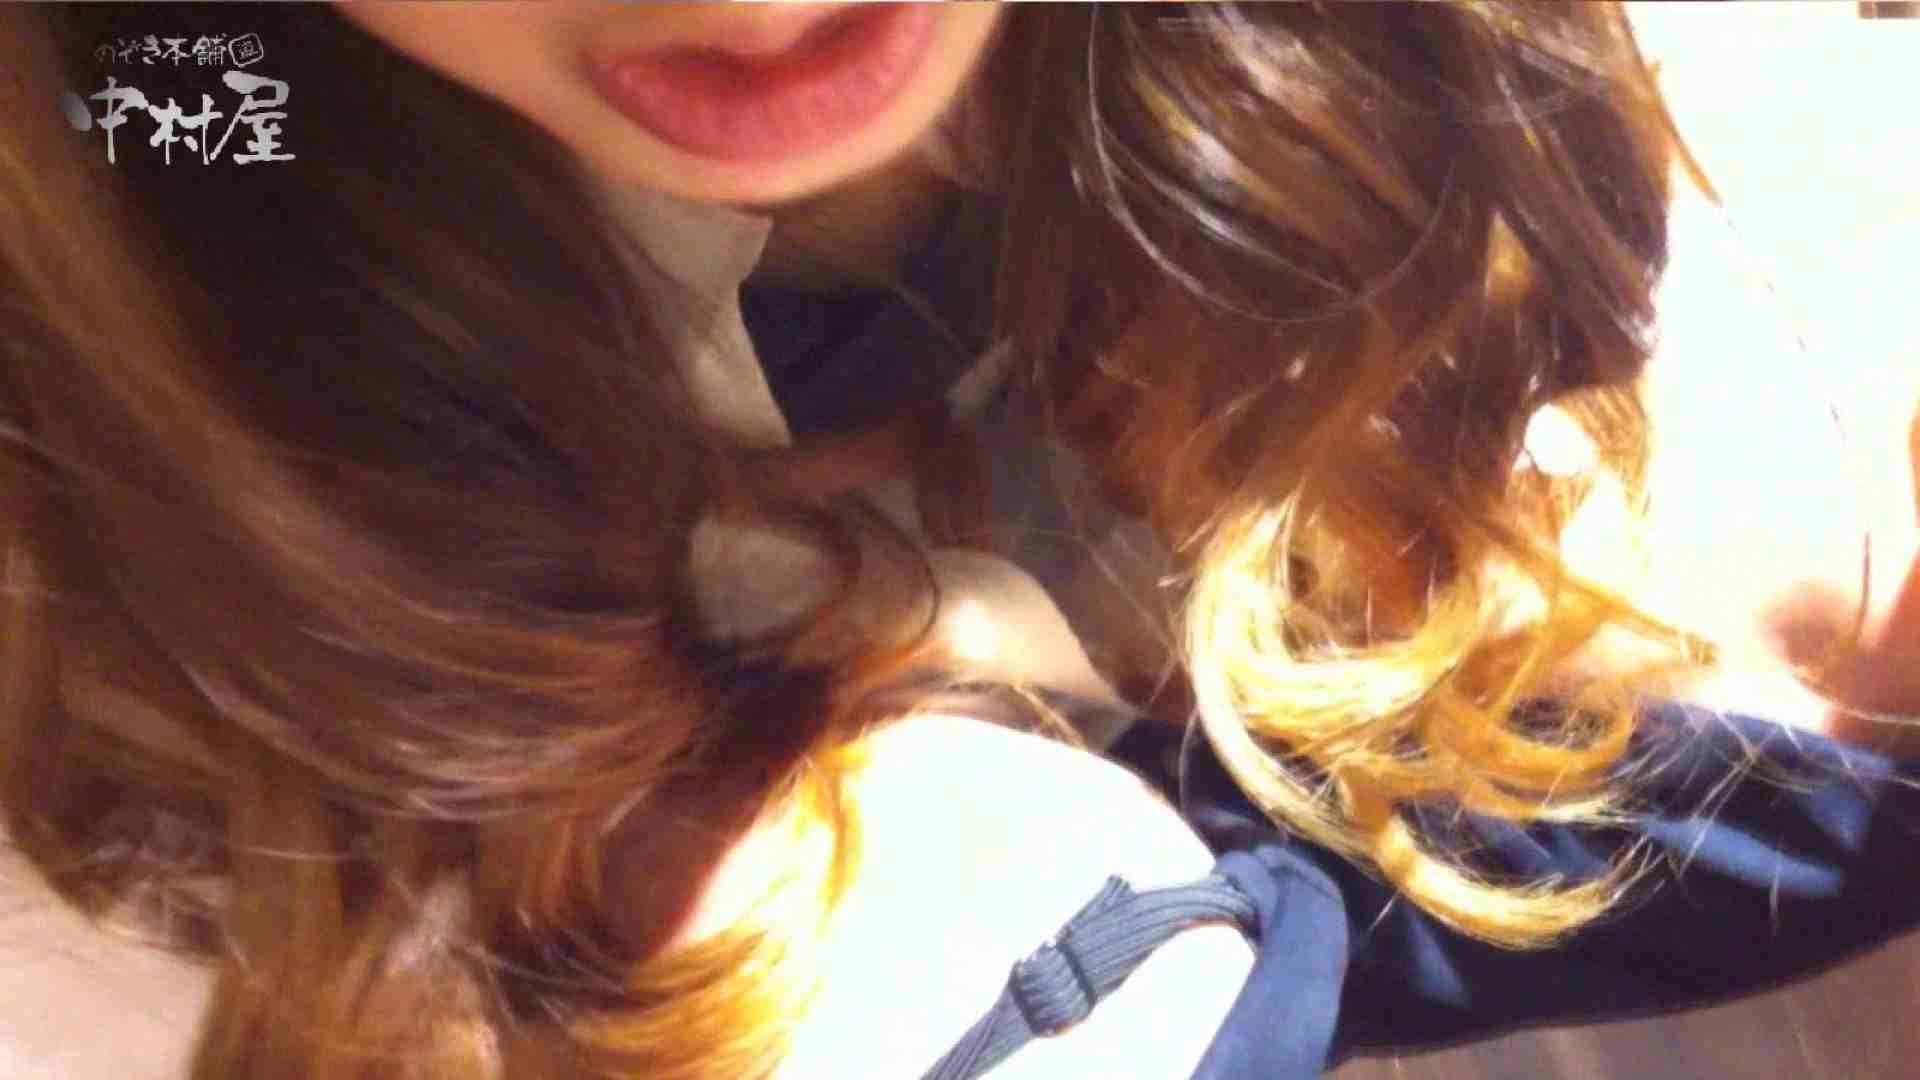 vol.85 美人アパレル胸チラ&パンチラ そそる唇の店員さん 接写 AV動画キャプチャ 97pic 13